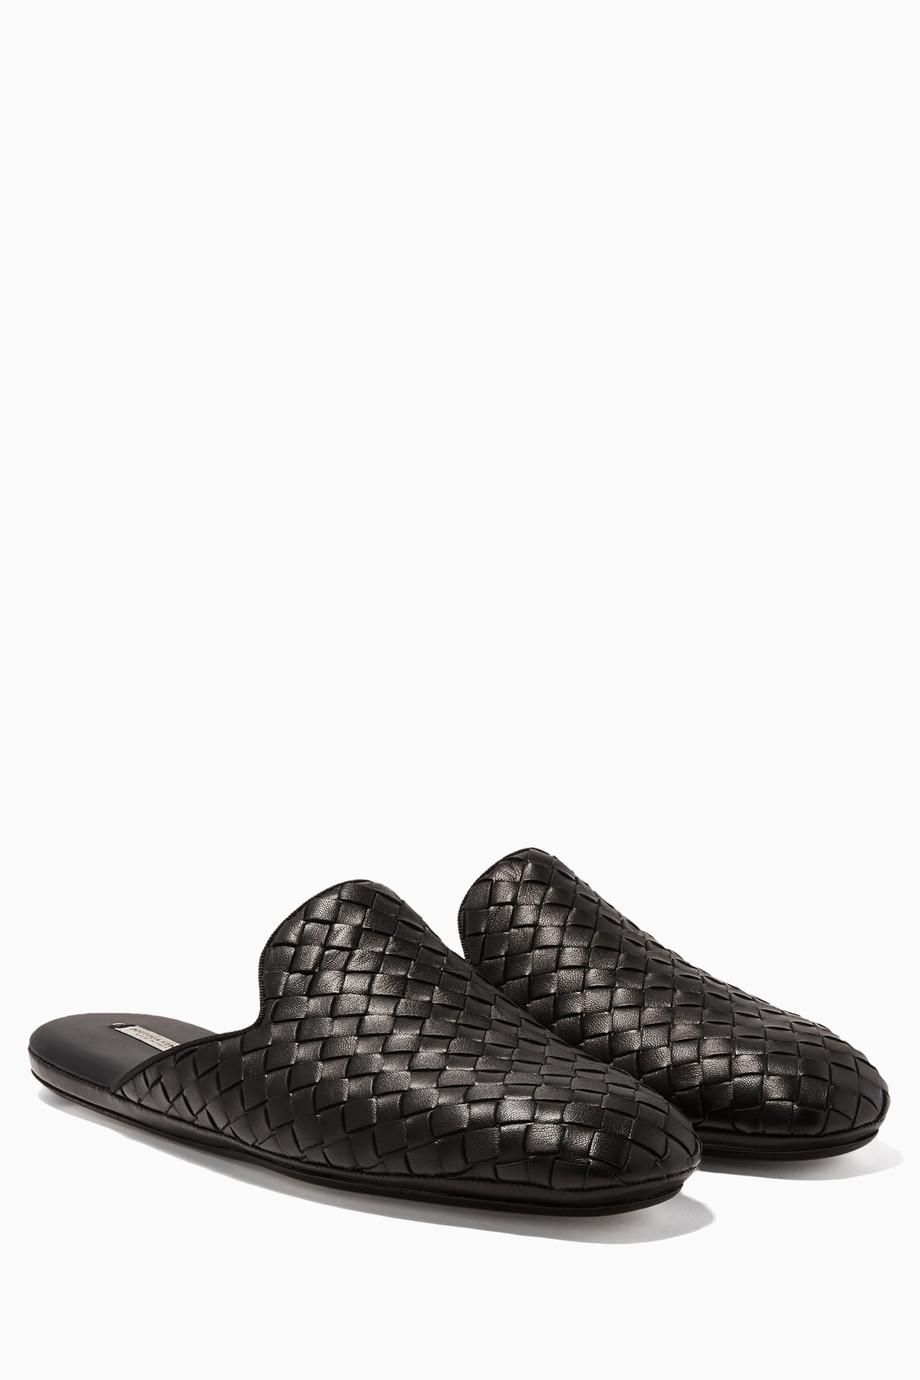 a9b1286e35cb6 Shop Bottega Veneta Black Black Intrecciato Backless Loafers for ...